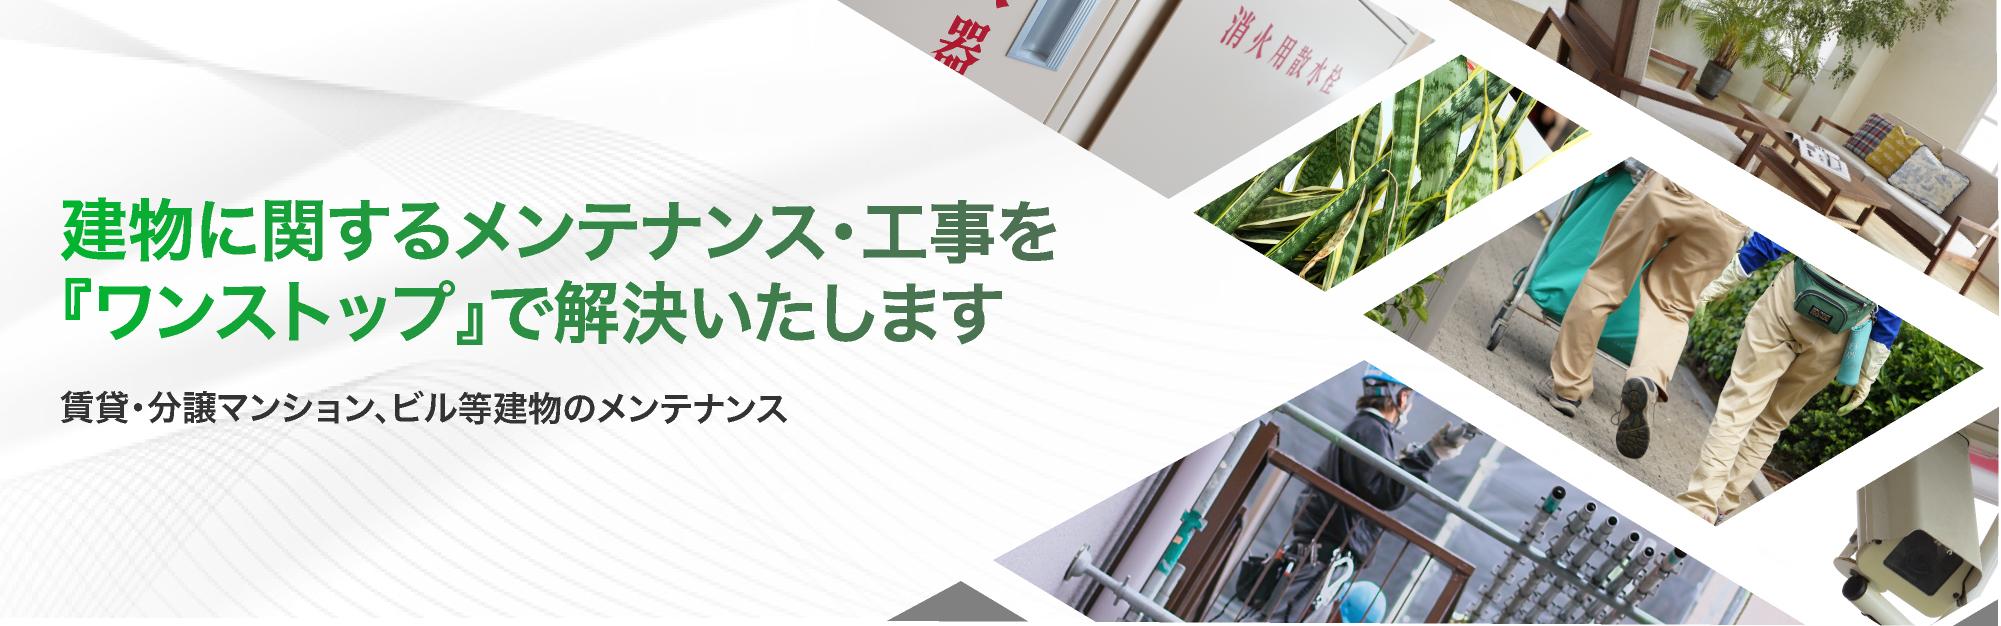 keishinのトップメインの画像